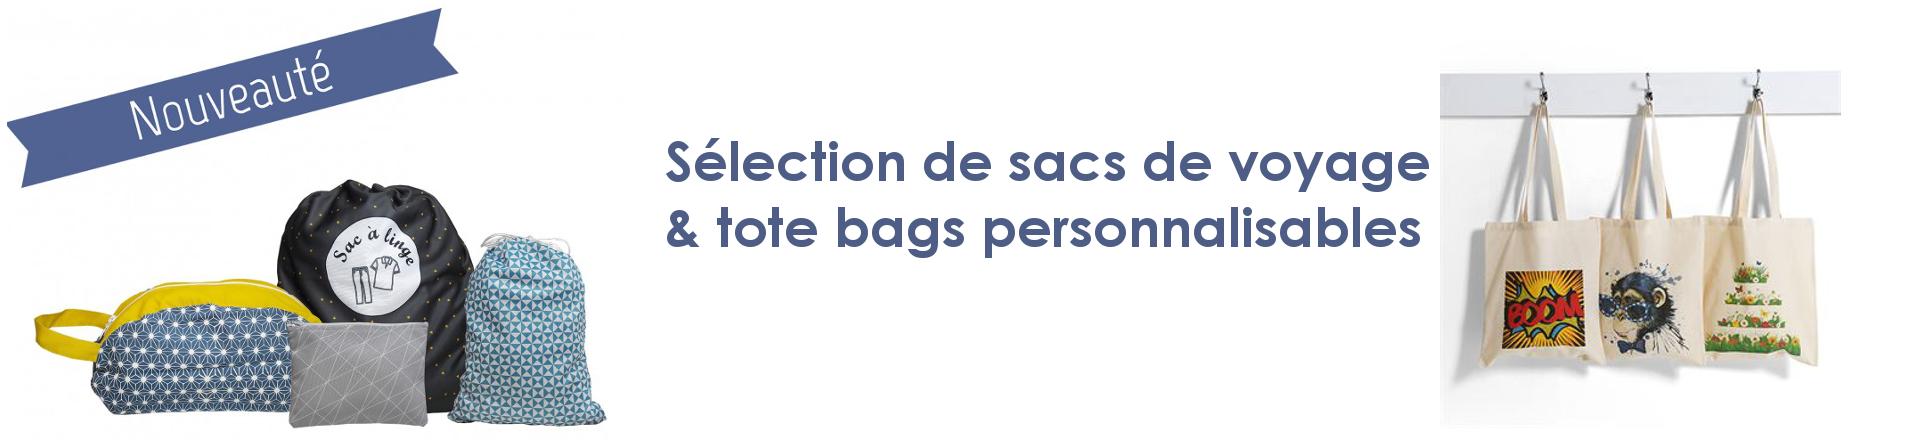 Bandeau-sac-0617